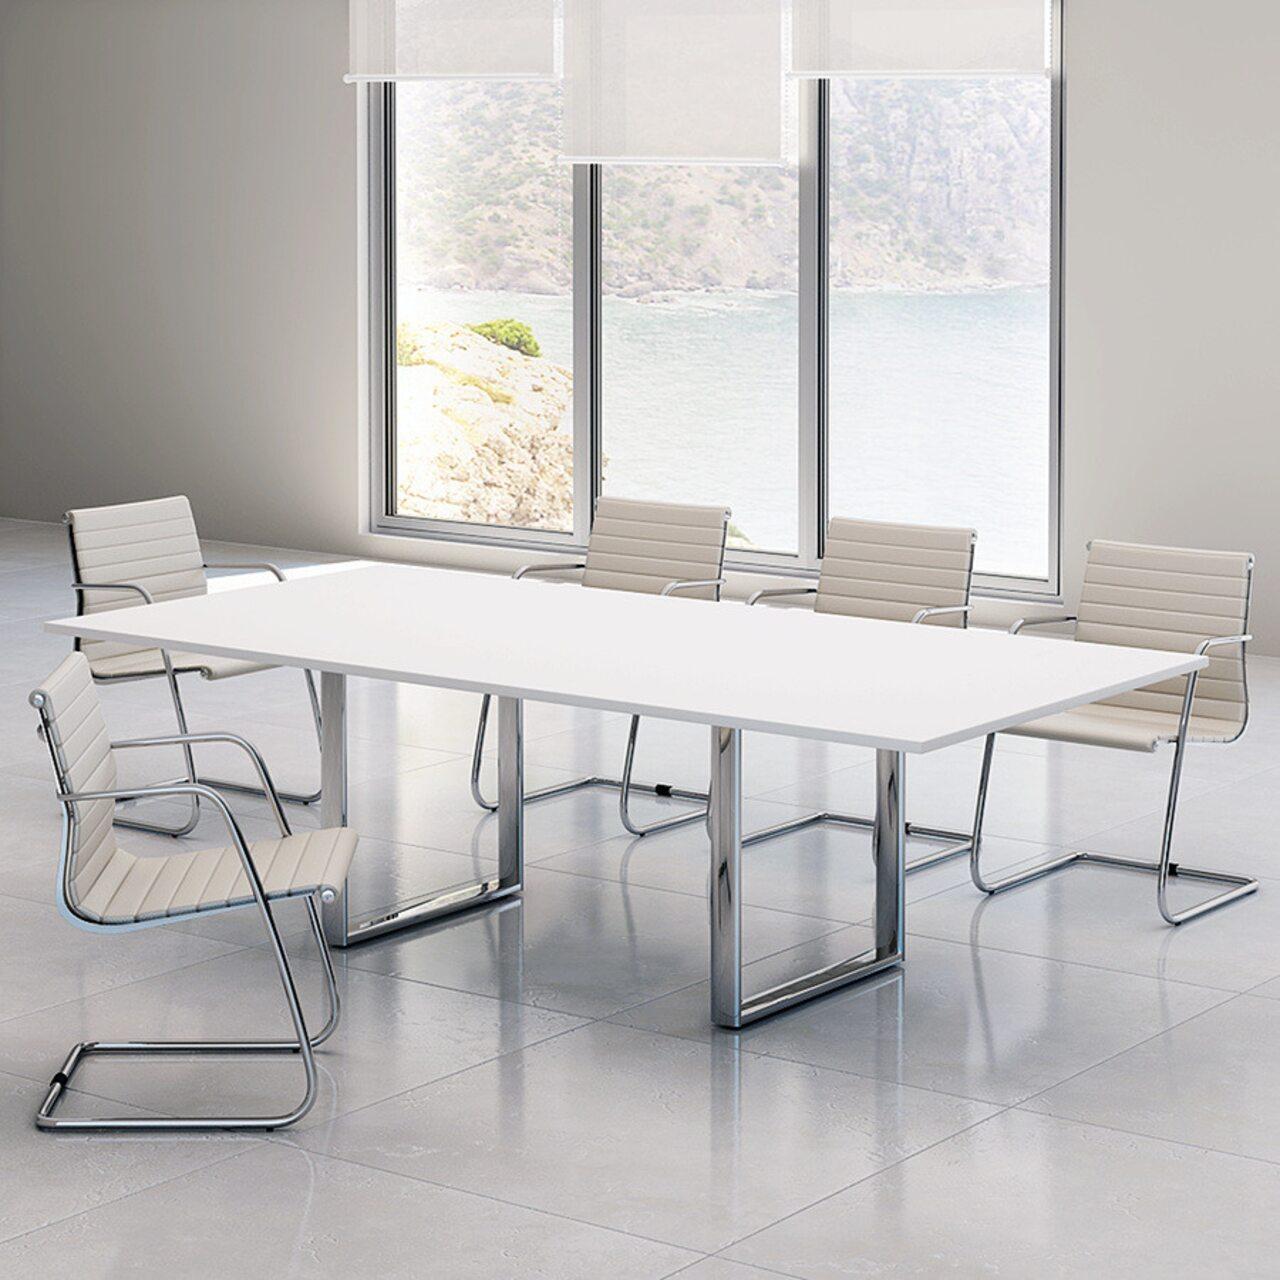 Стол для переговоров Orbis-Carre Meeting - фото 3